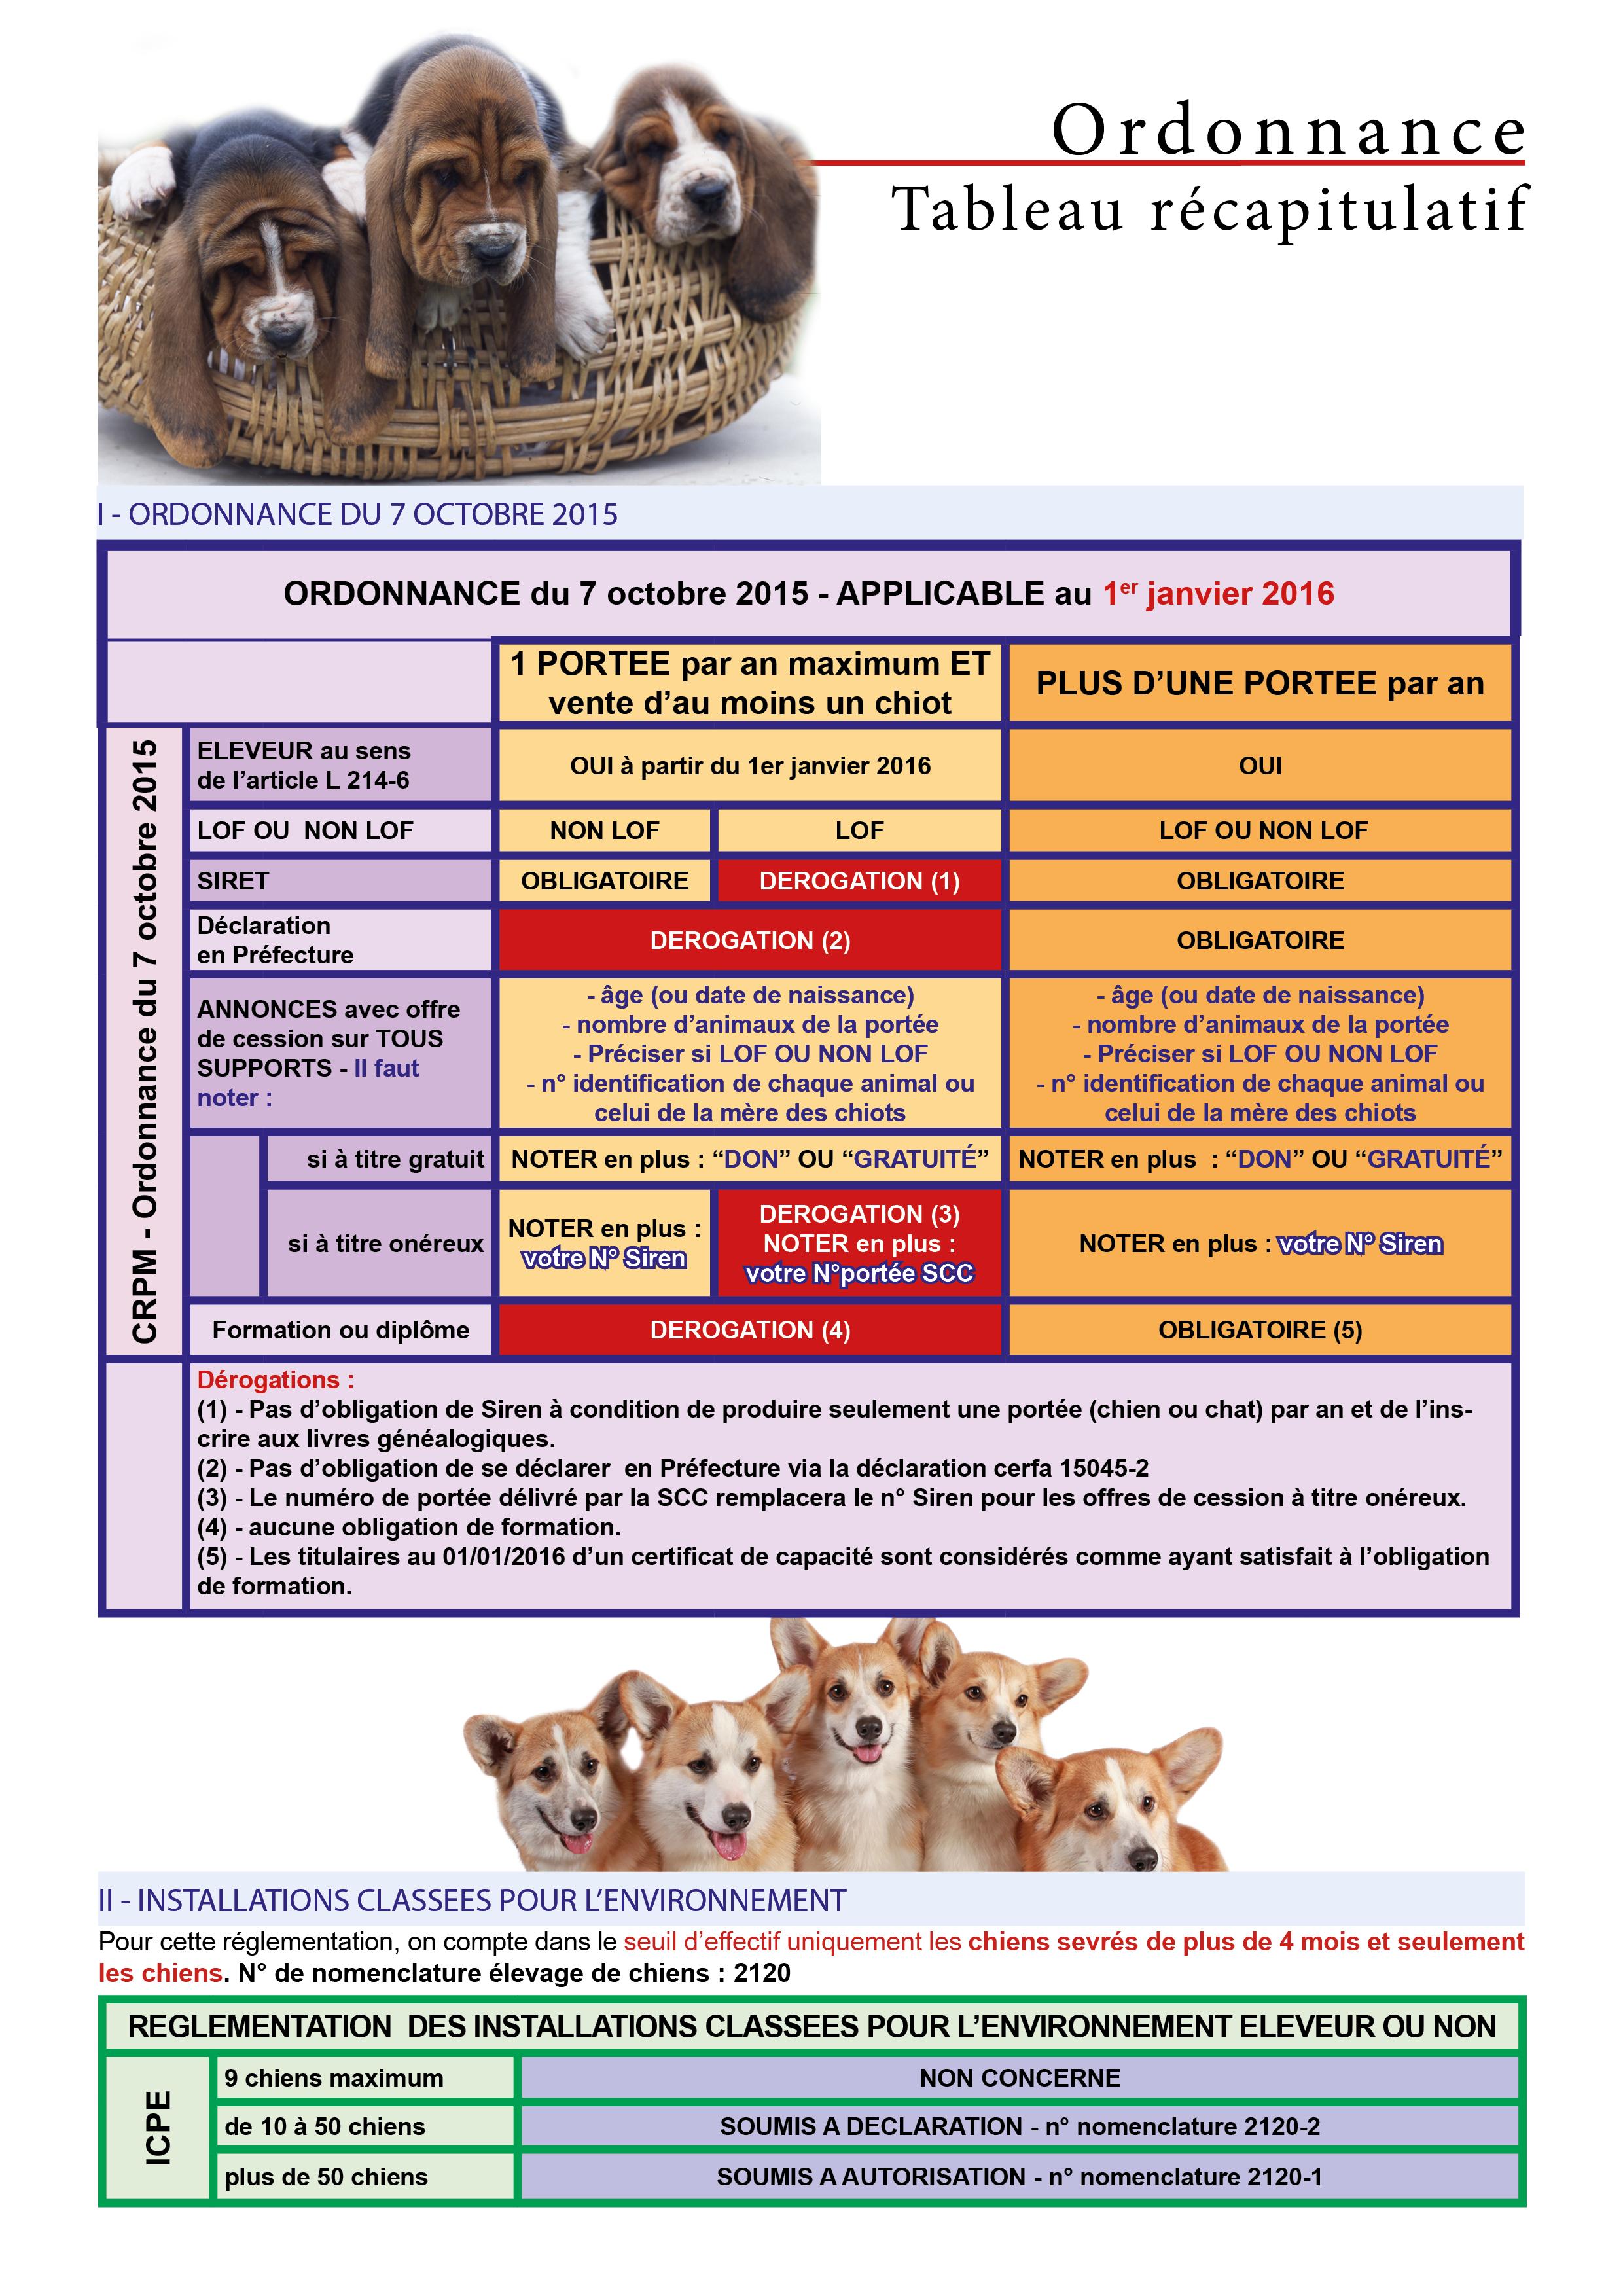 centrale canine banque d'information